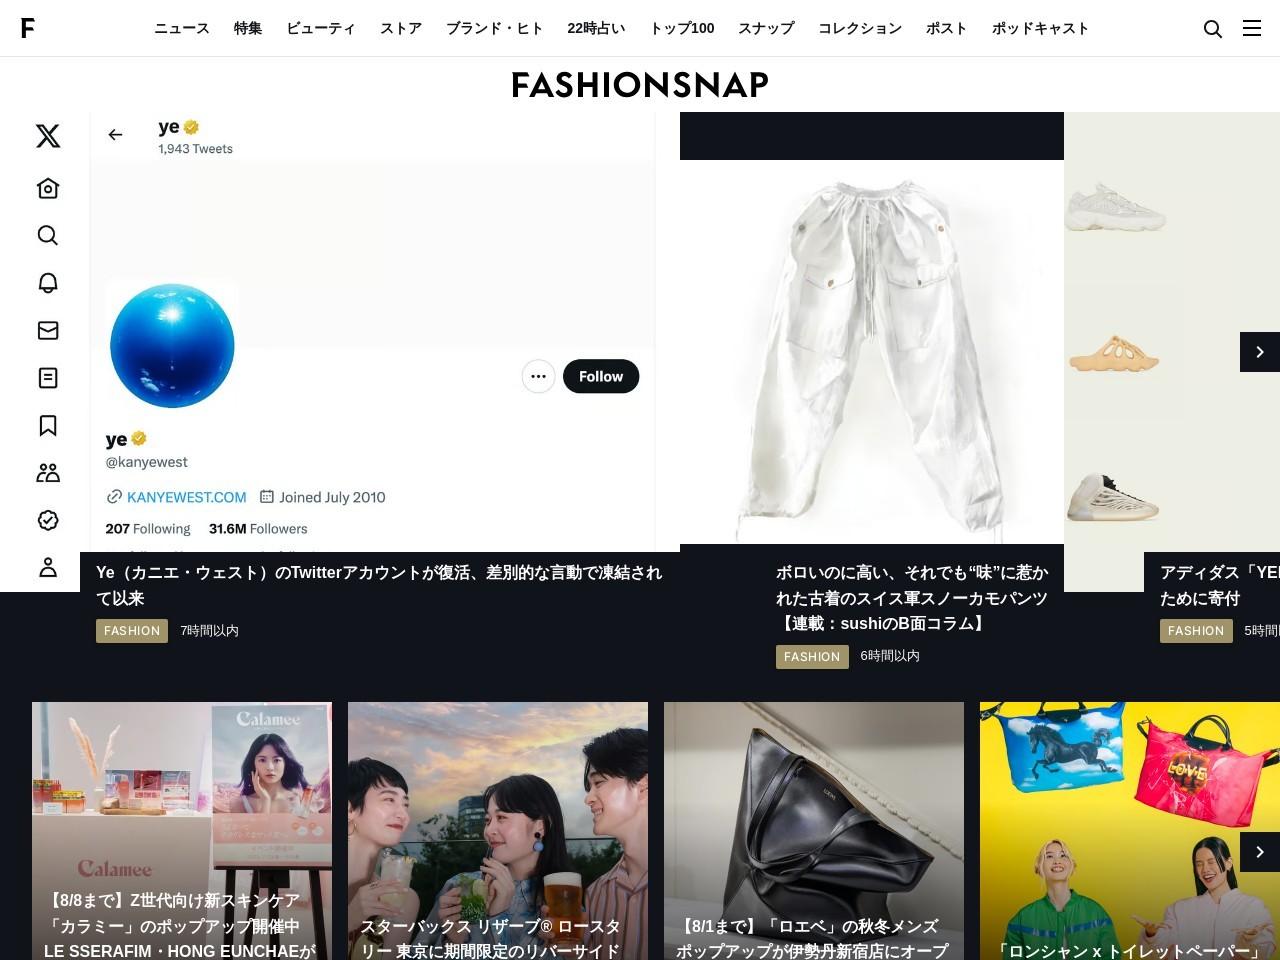 Screenshot of www.fashionsnap.com